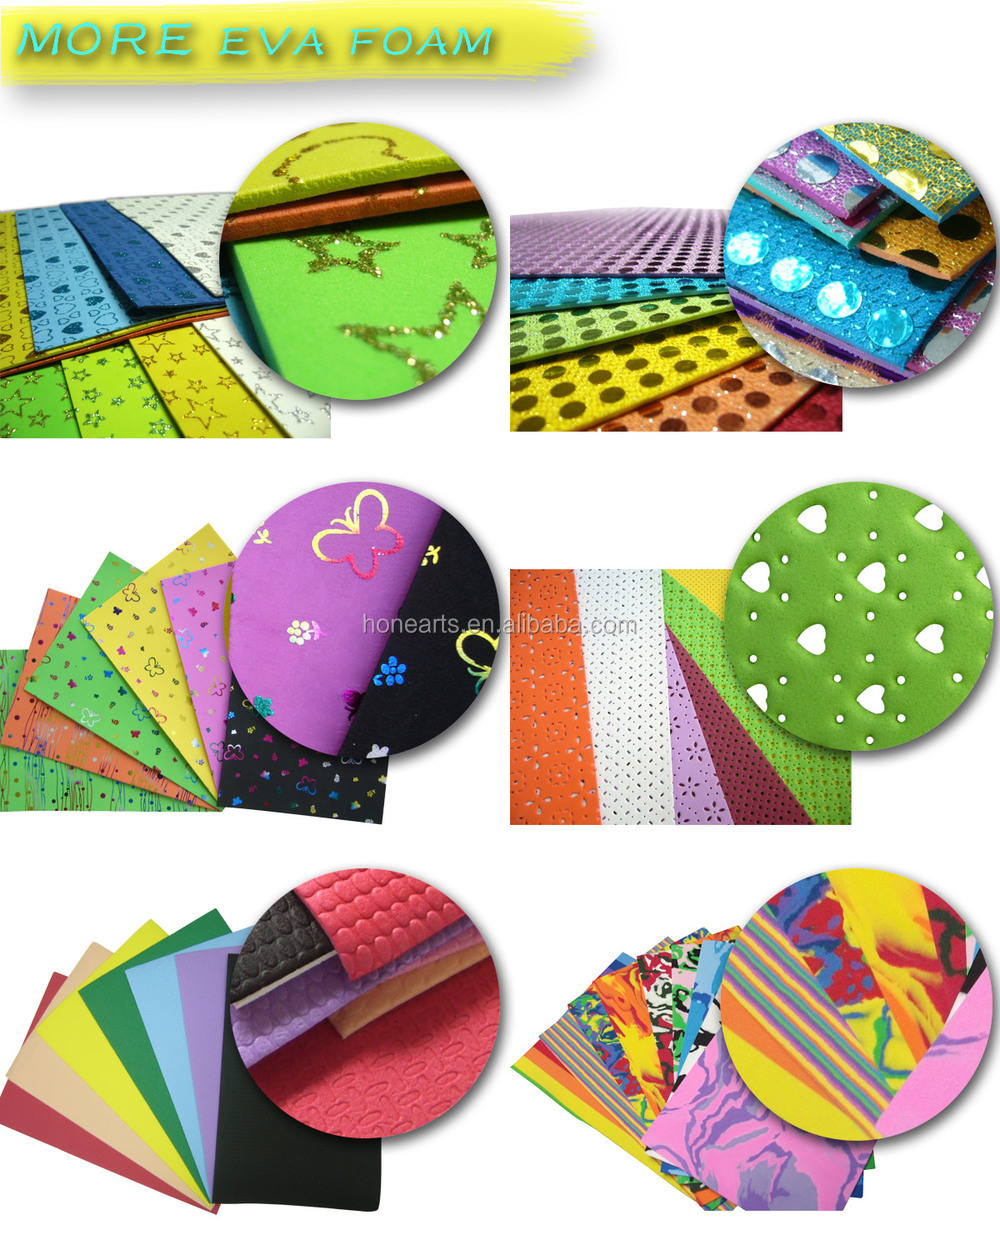 Goma Eva Foam Craft Form Children's Handworking - Buy Goma Eva ...